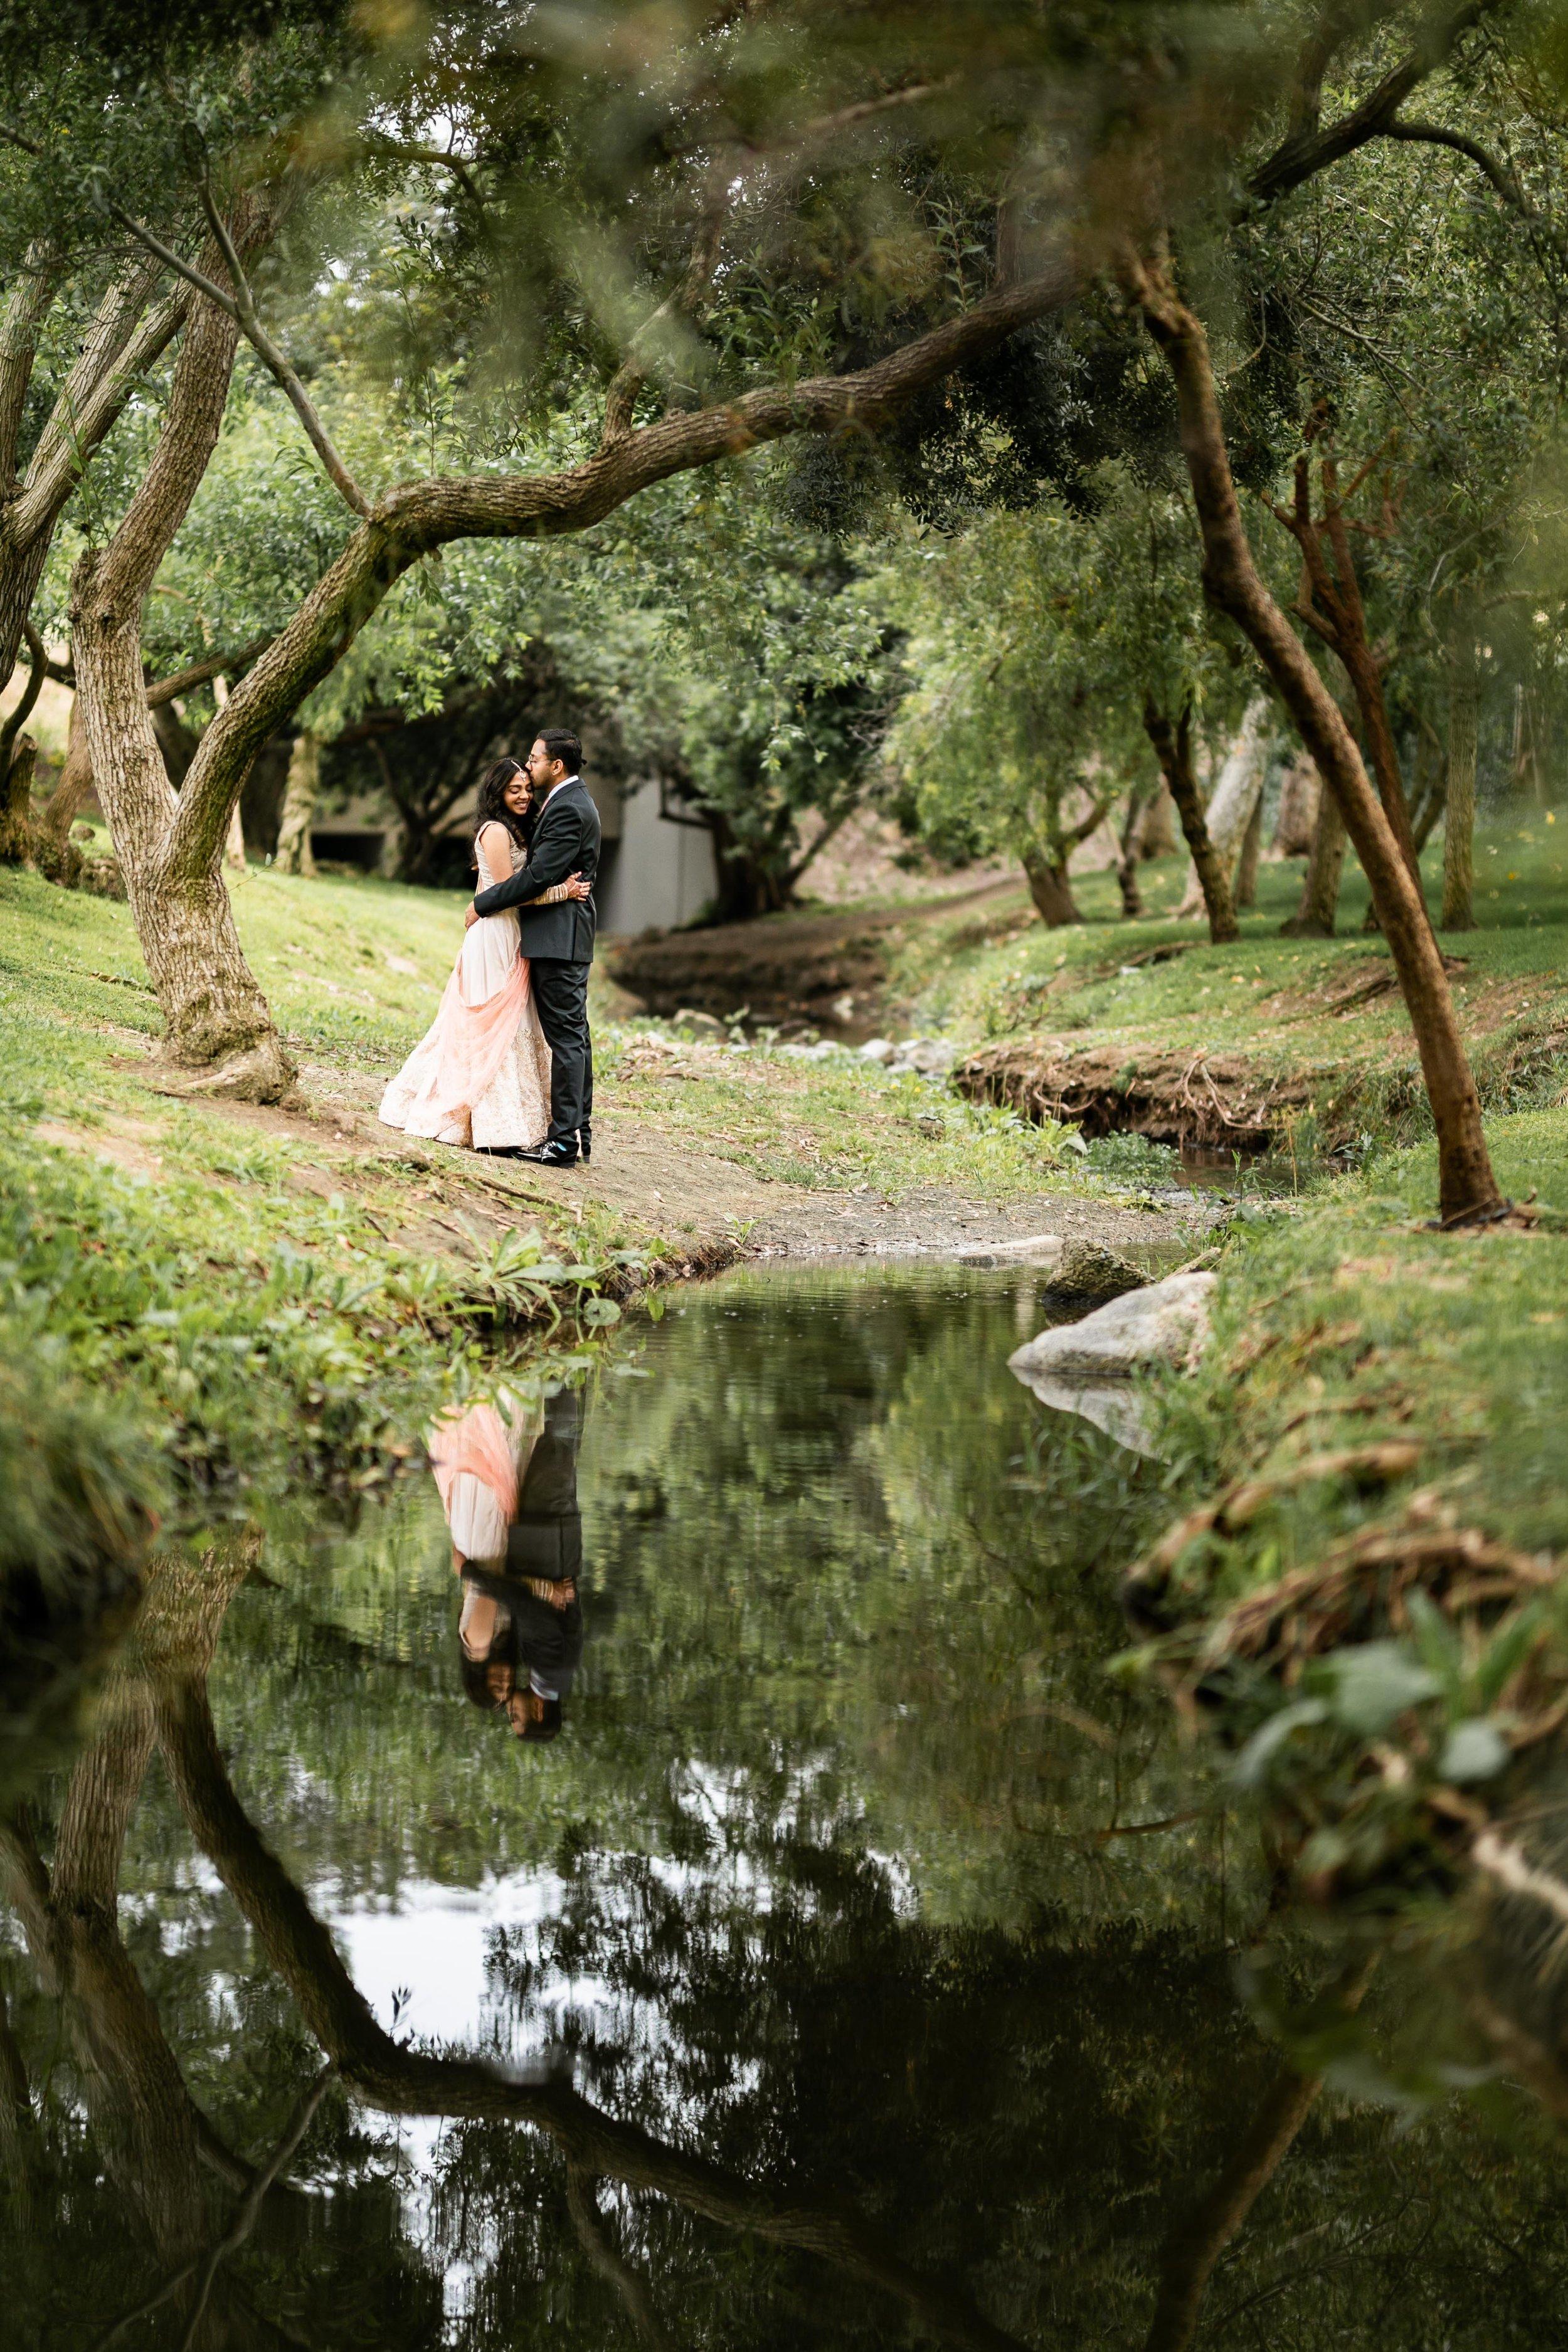 indian_ reception_southern_california_wedding_joshuachun_photography-5.JPG